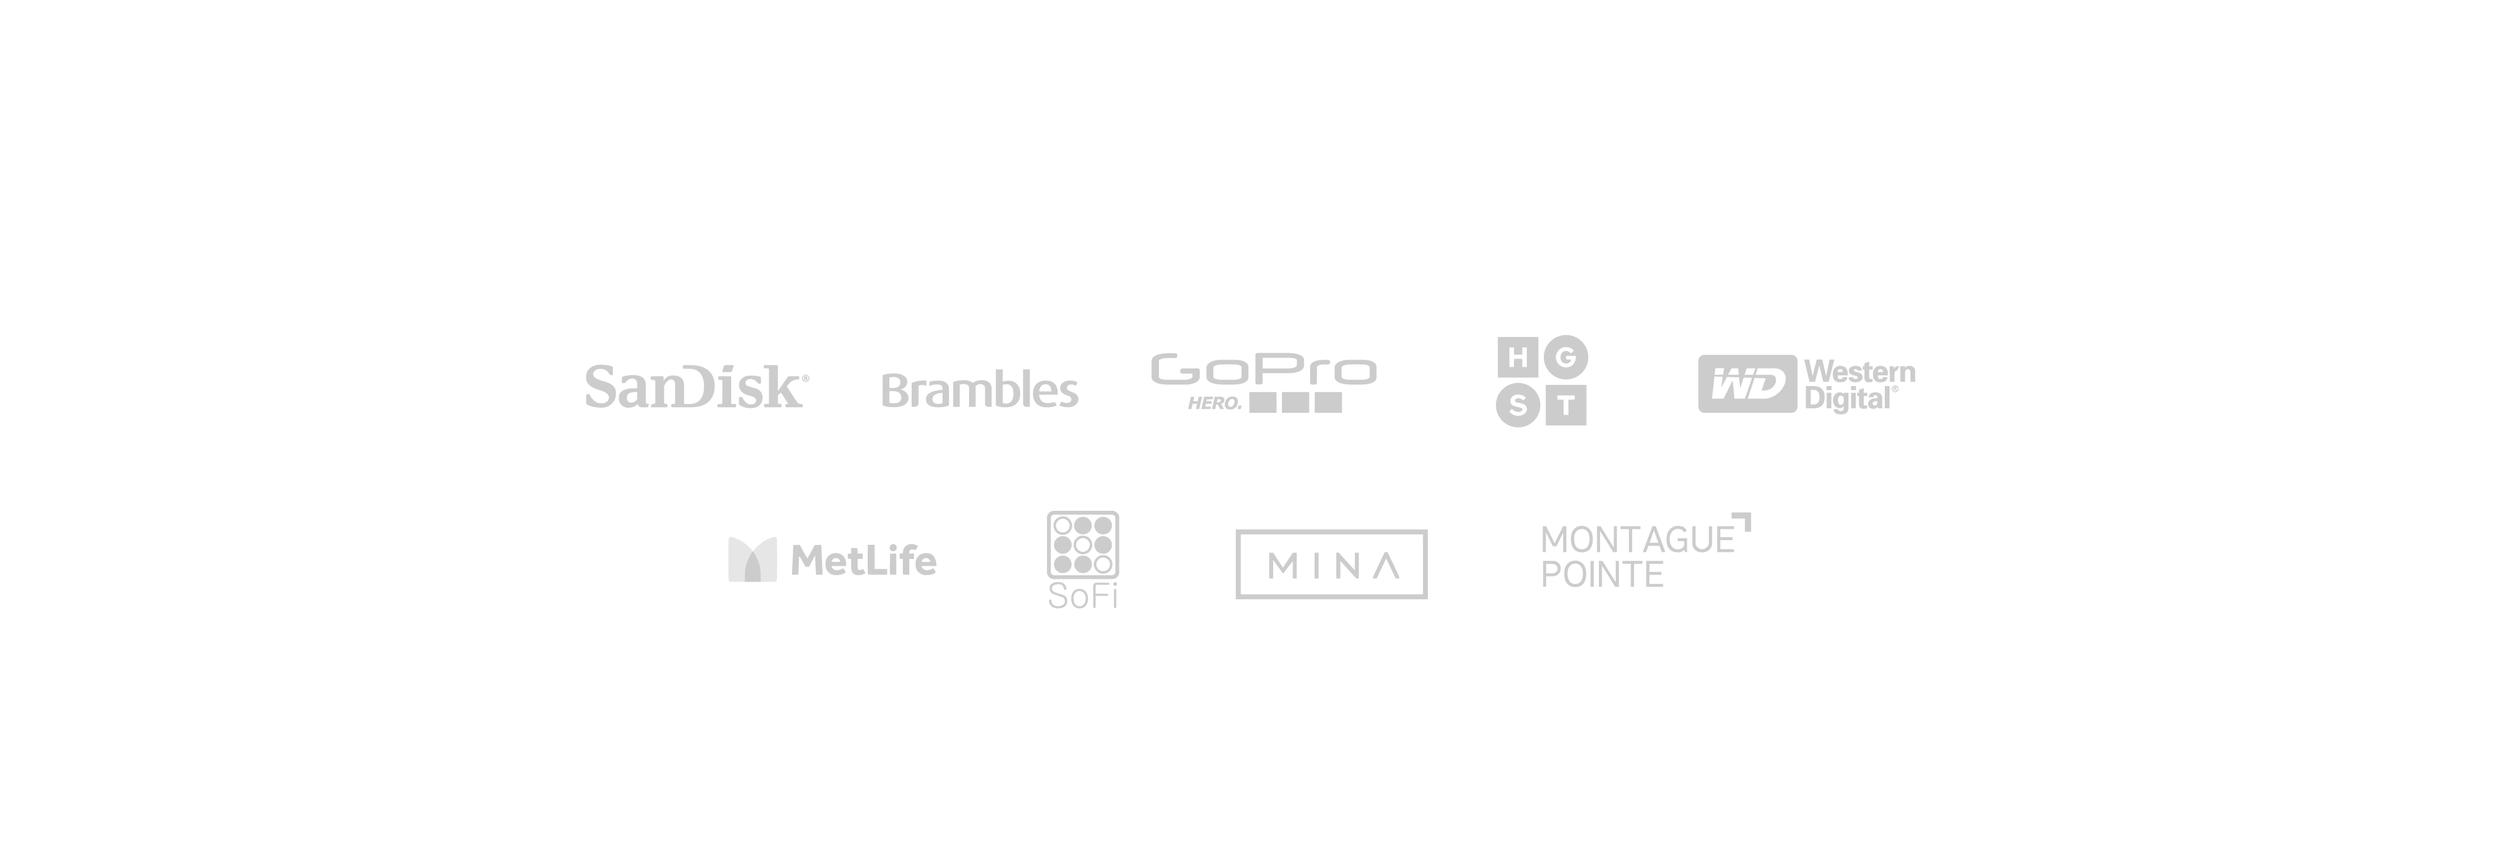 WorkplaceWellness-Logos-01.png